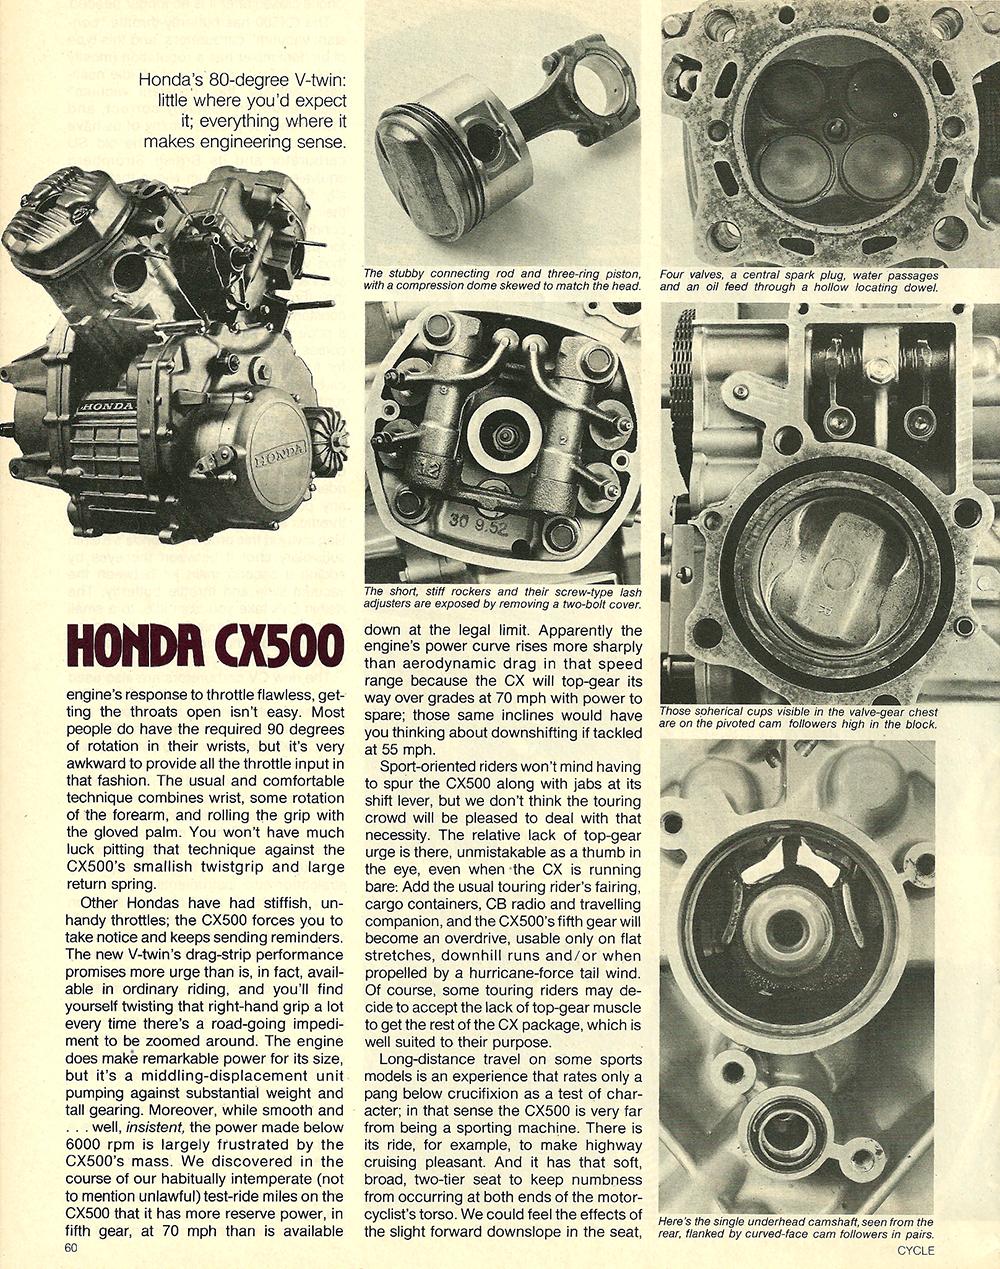 1978 Honda CX500 road test 05.jpg